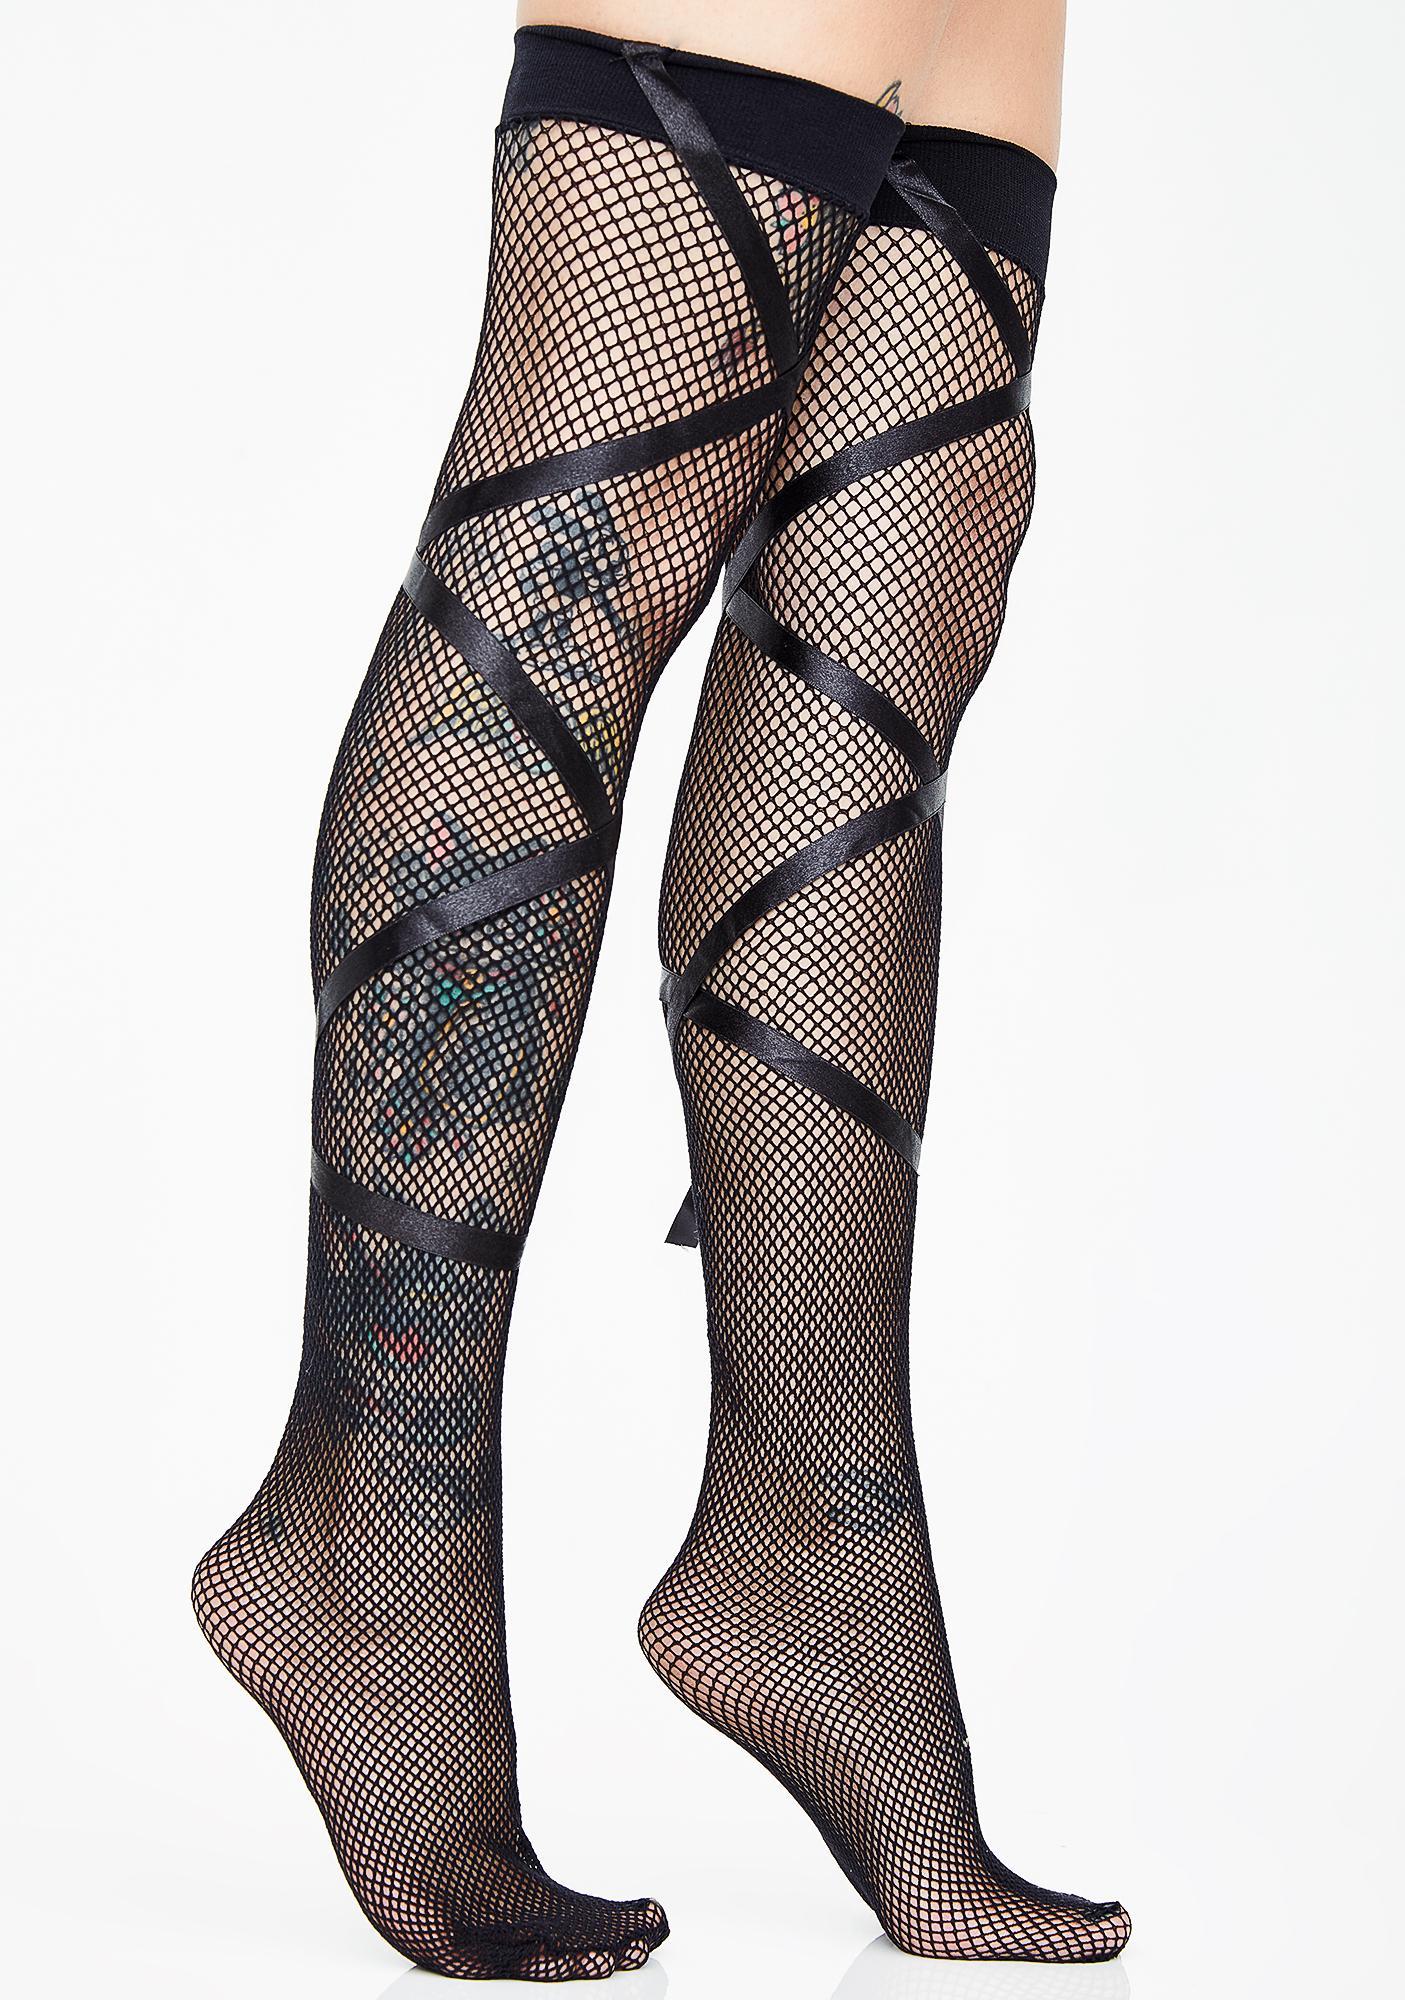 Endearingly Cute Ribbon Stockings